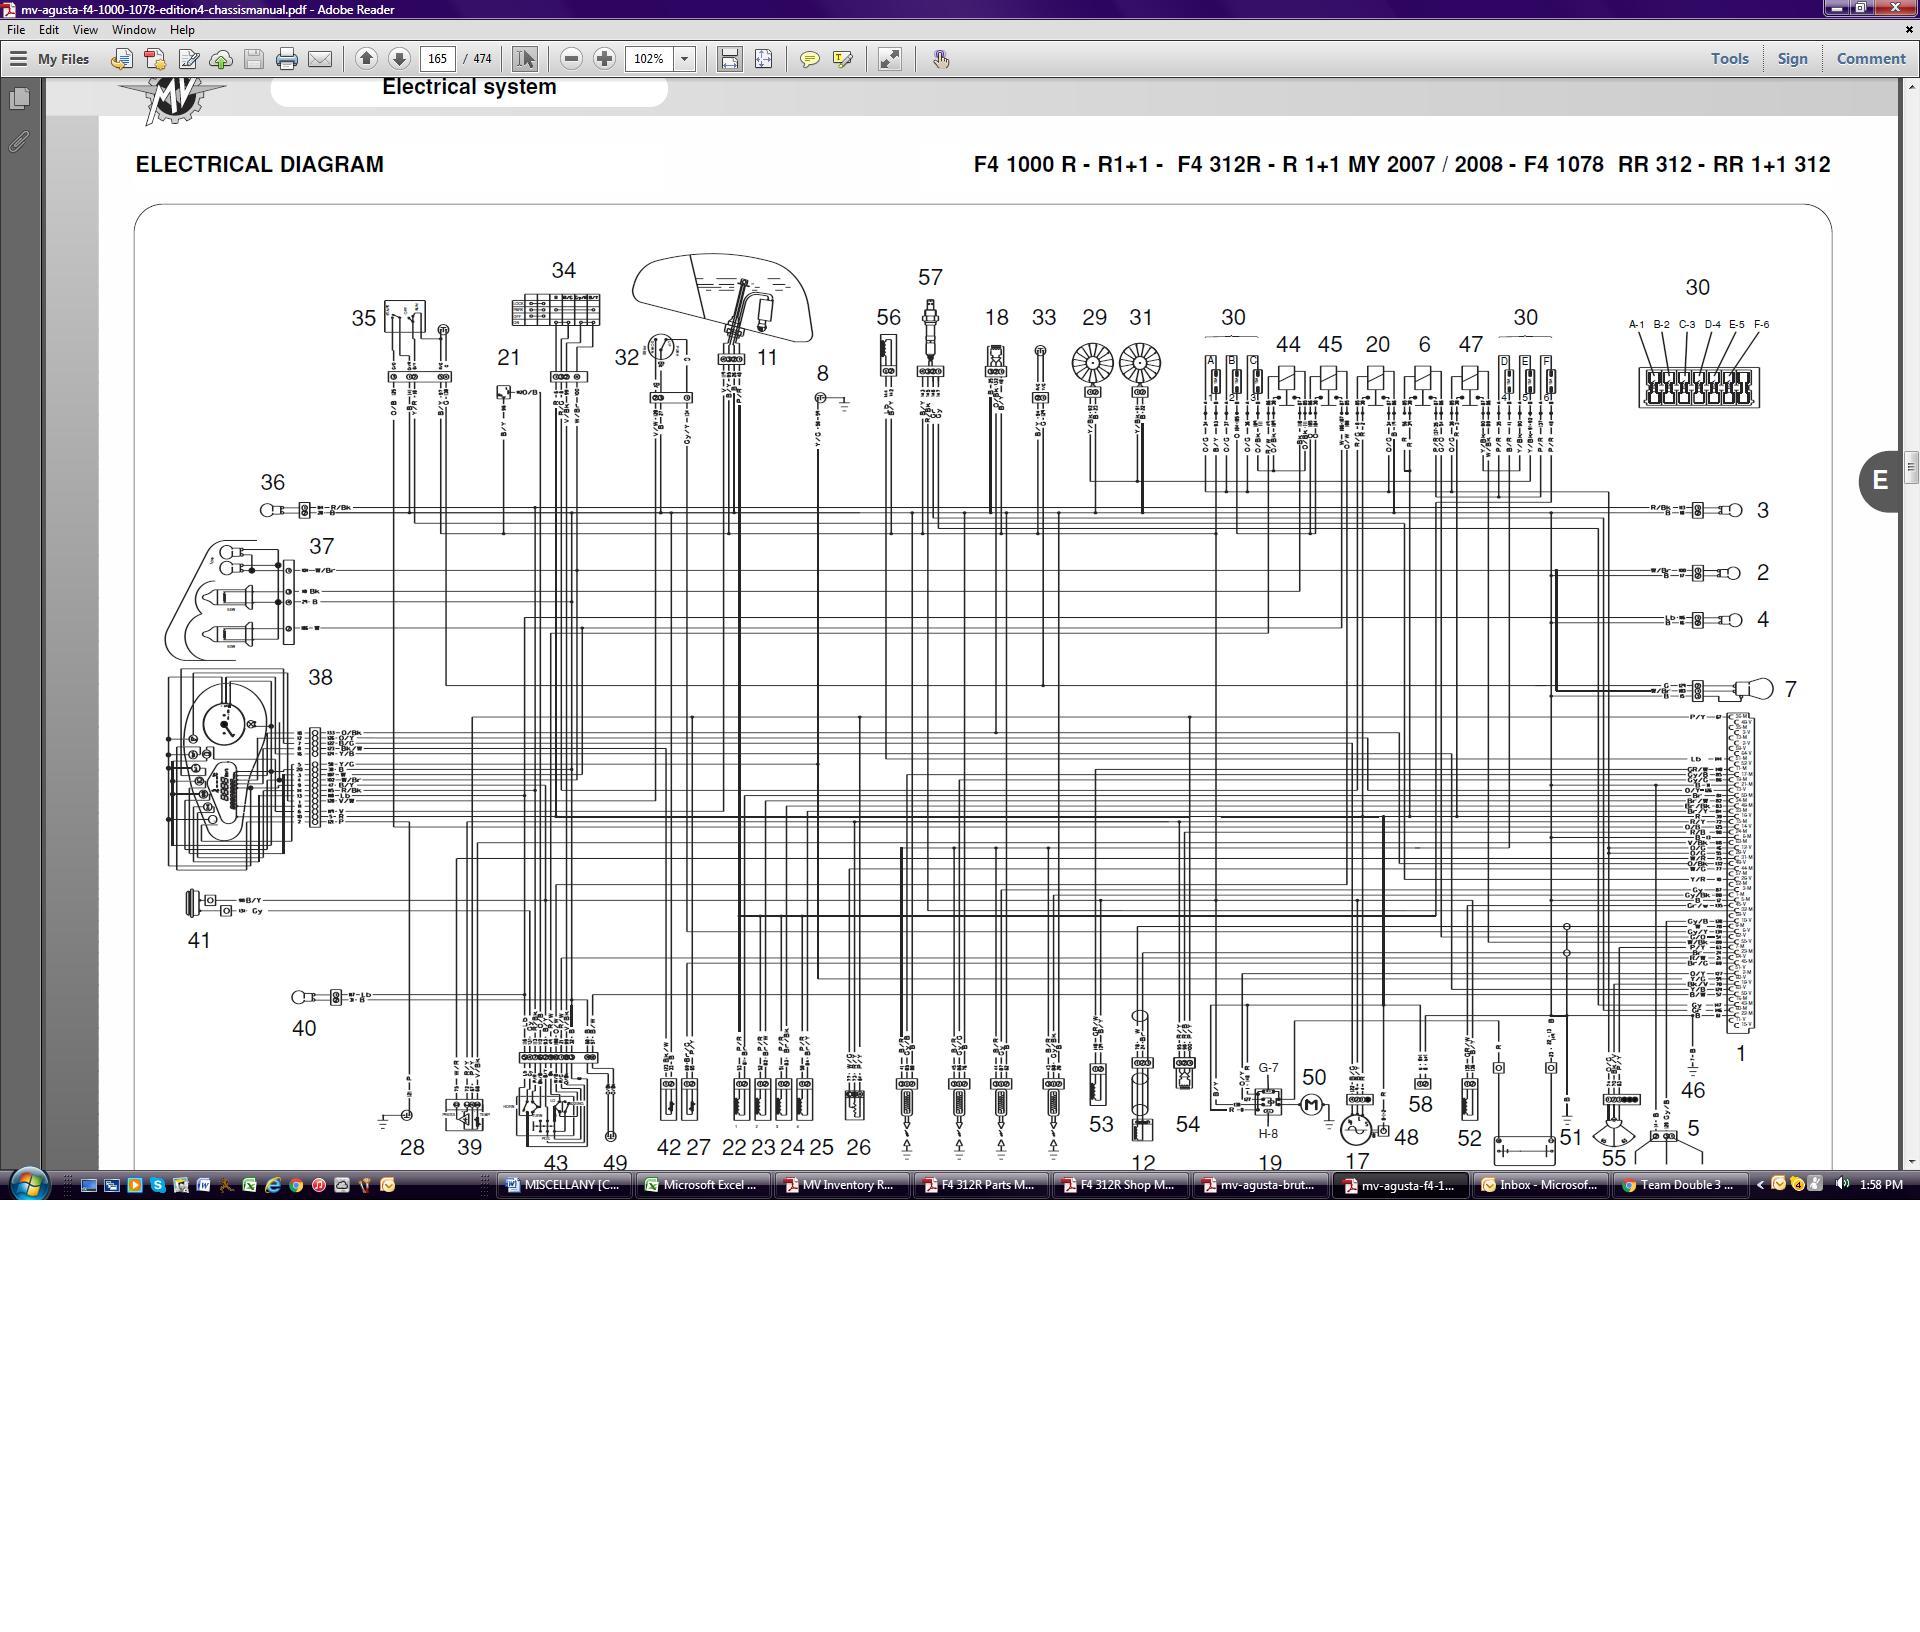 mv agusta brutale wiring diagram i need a wiring diagram for a 2009 1078 312rr please    mv  wiring diagram for a 2009 1078 312rr